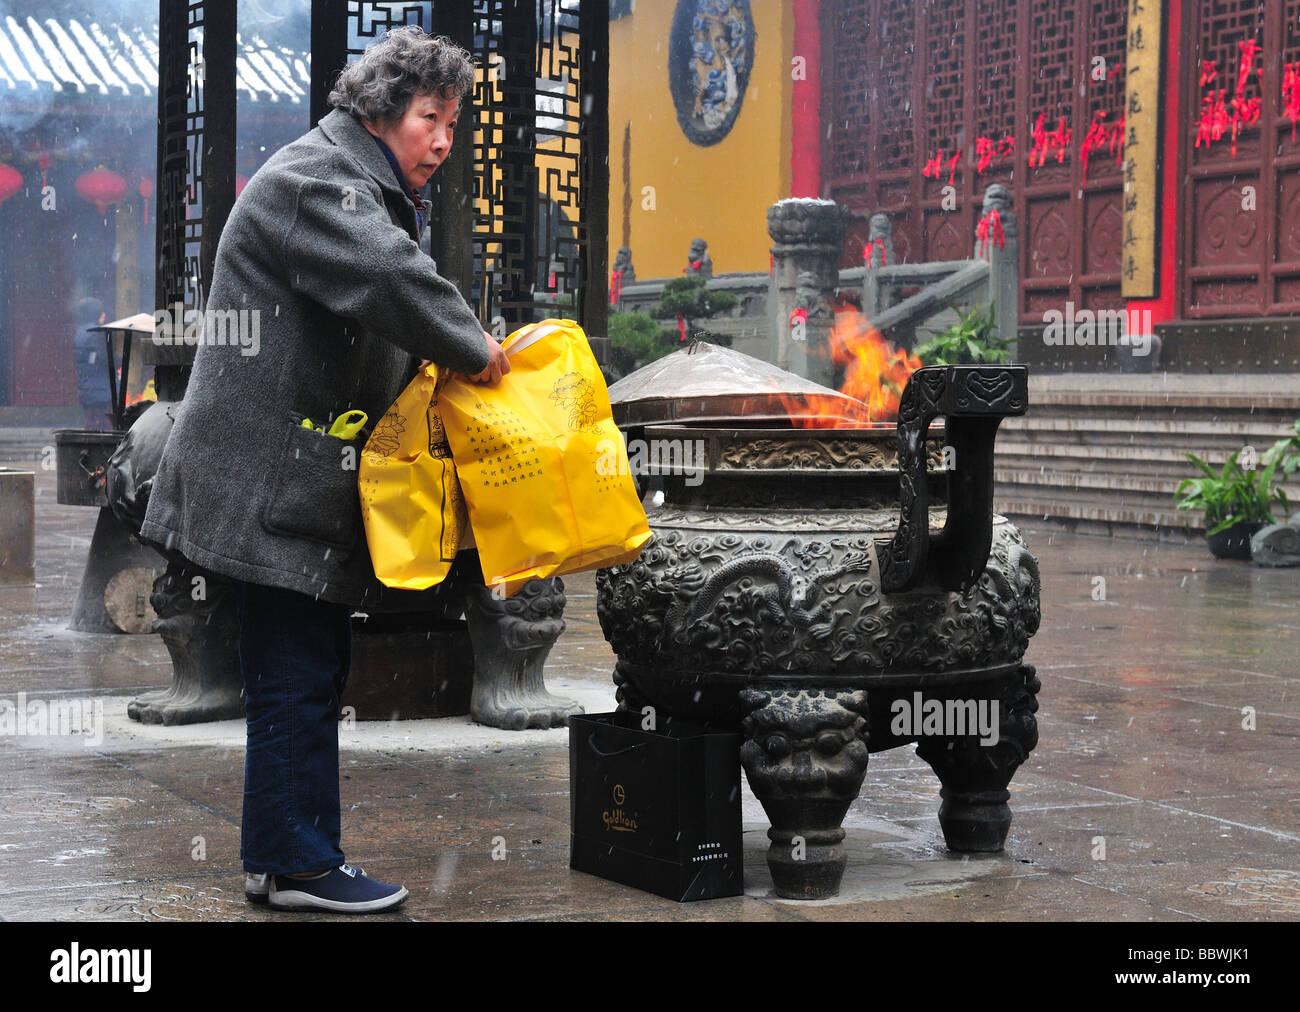 worshiper in Chinese buddhist shrine in the city of Shanghai China - Stock Image